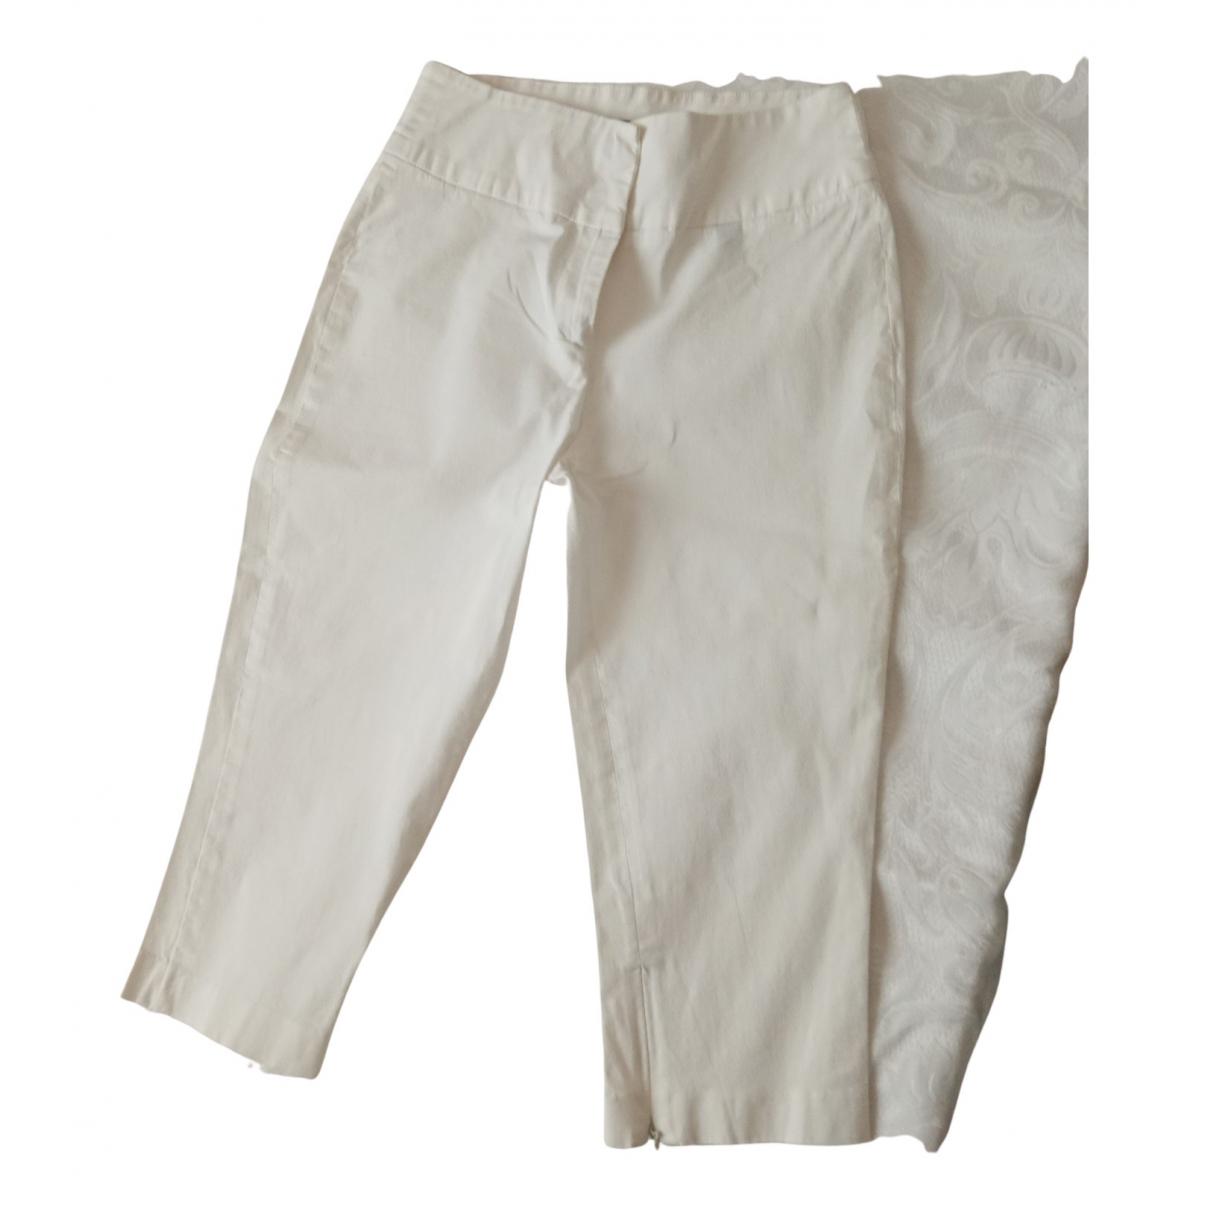 Pantalones en Algodon Blanco D&g